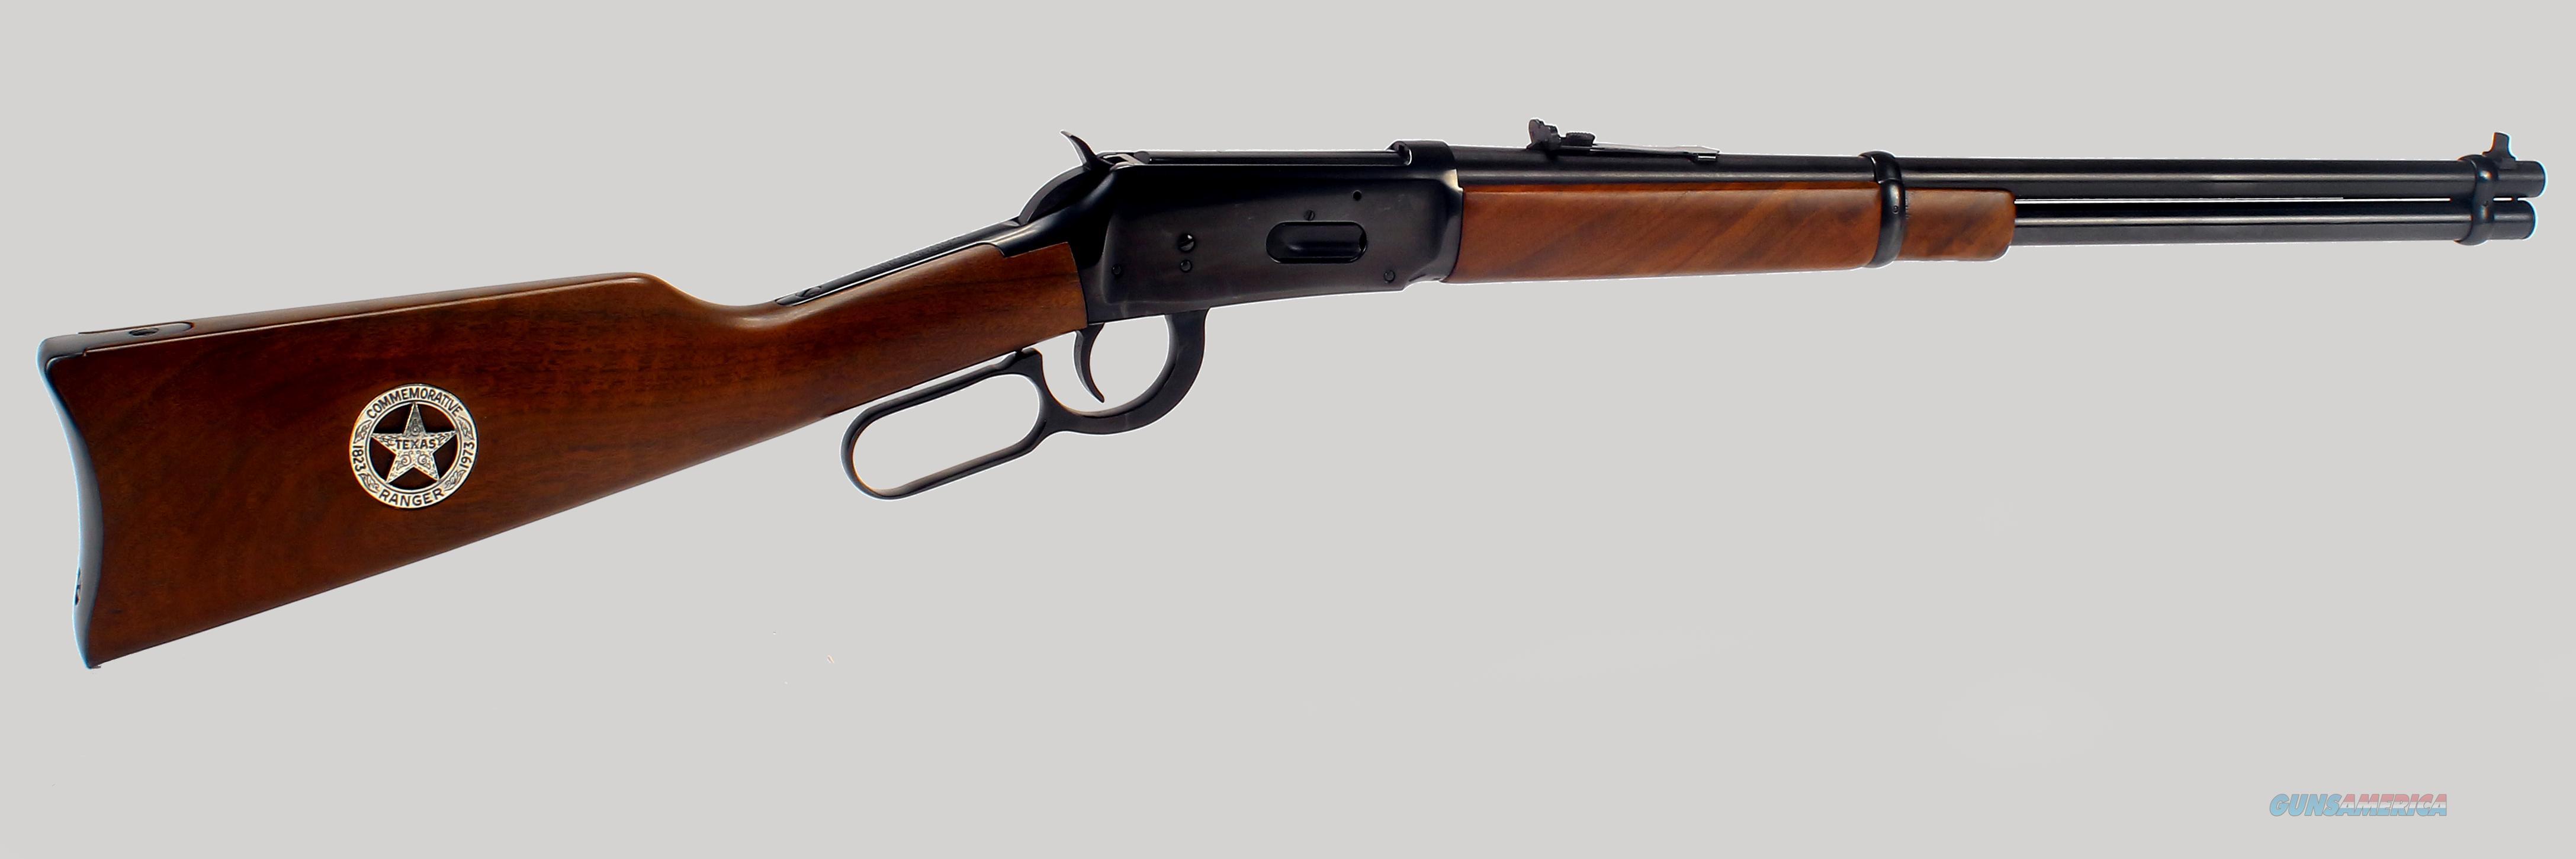 Winchester 30-30 Model 1894 Rifle Texas Ranger for sale